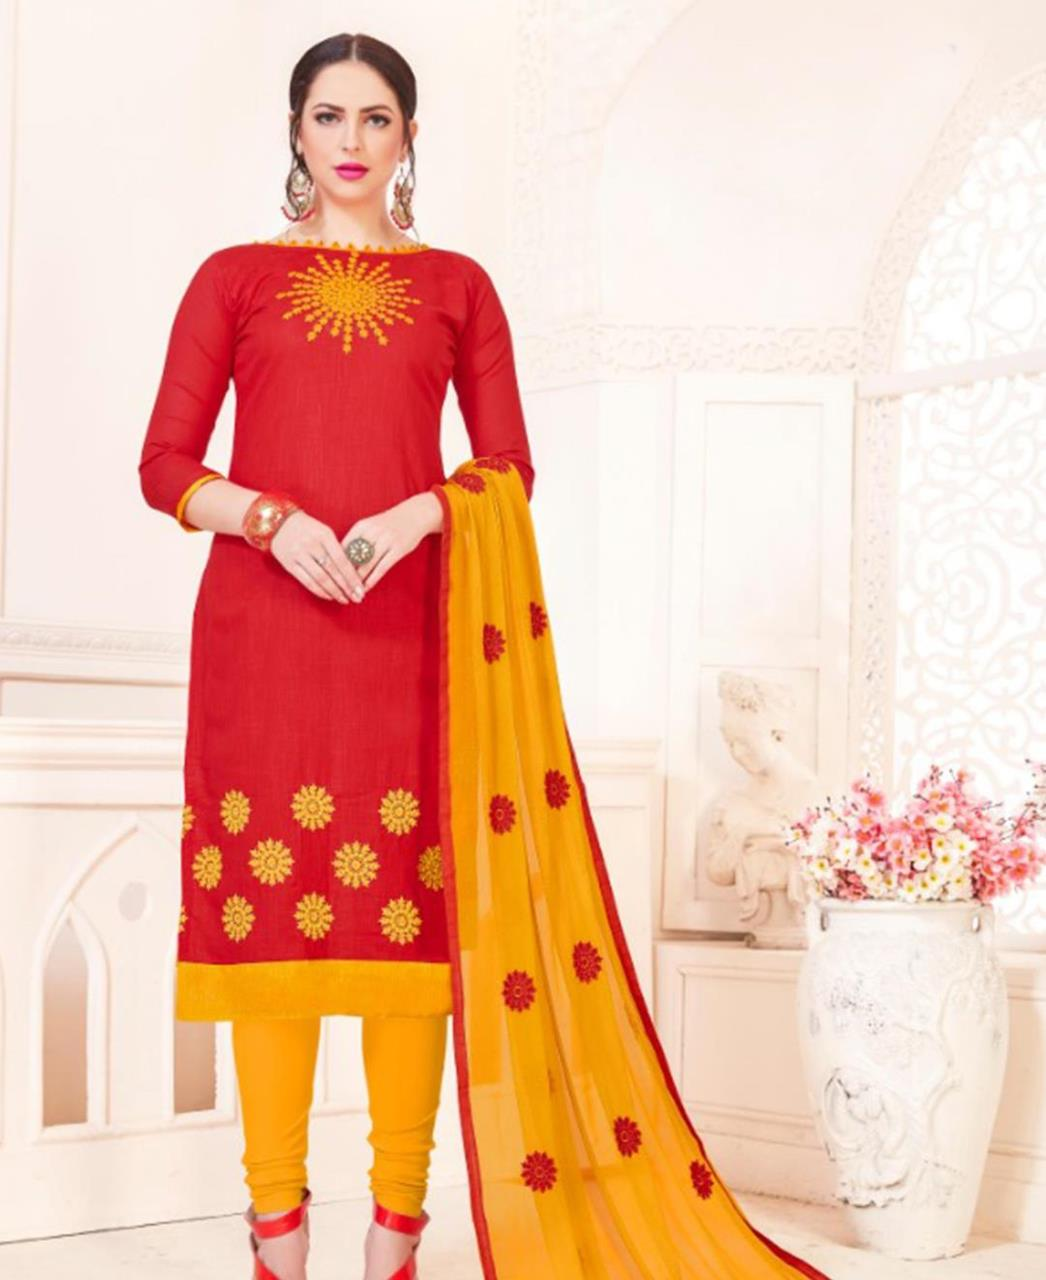 Embroidered Cotton Red Straight Cut Salwar Kameez